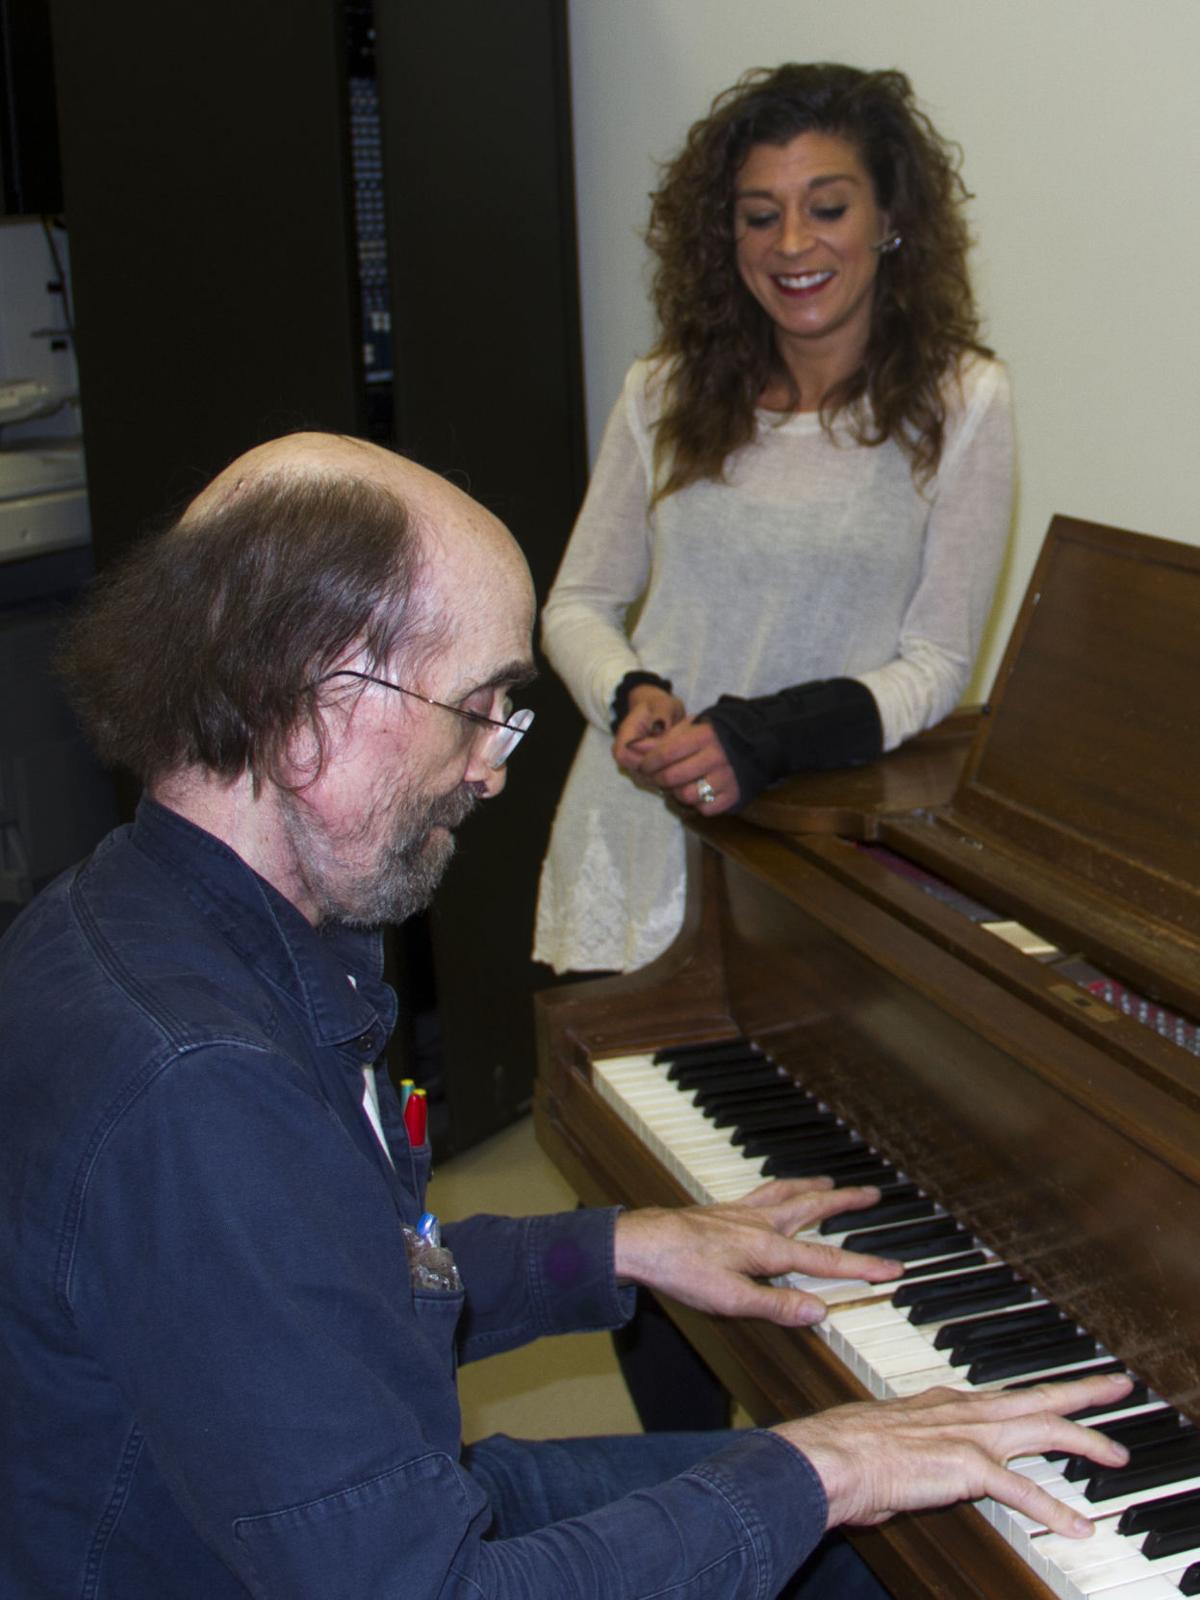 George Winston and Katie Harrill